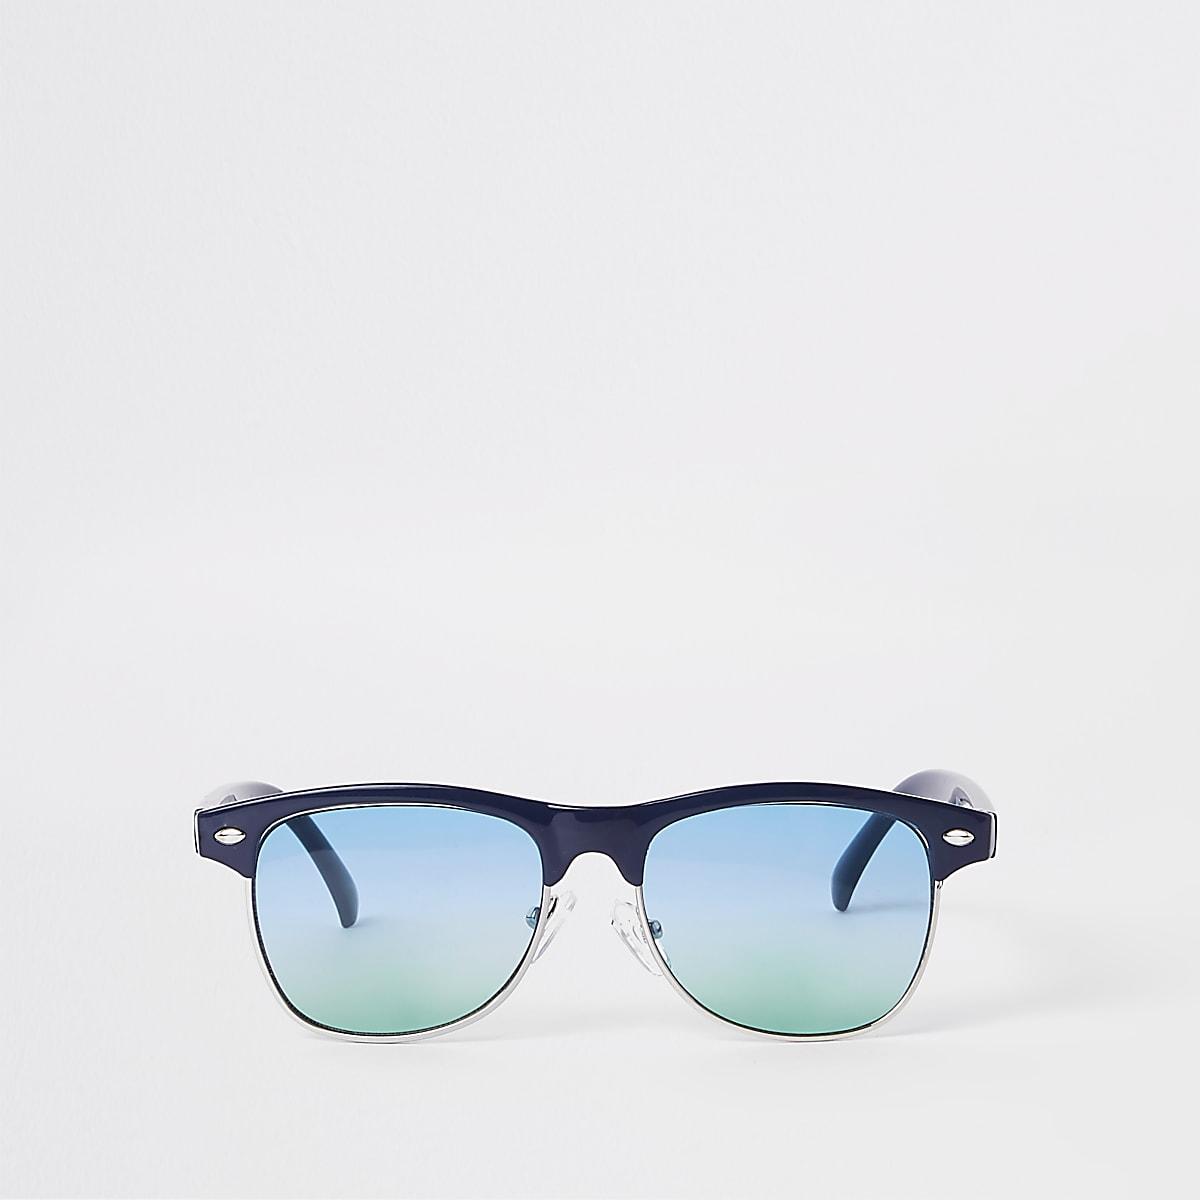 Boys blue flat top green lens sunglasses